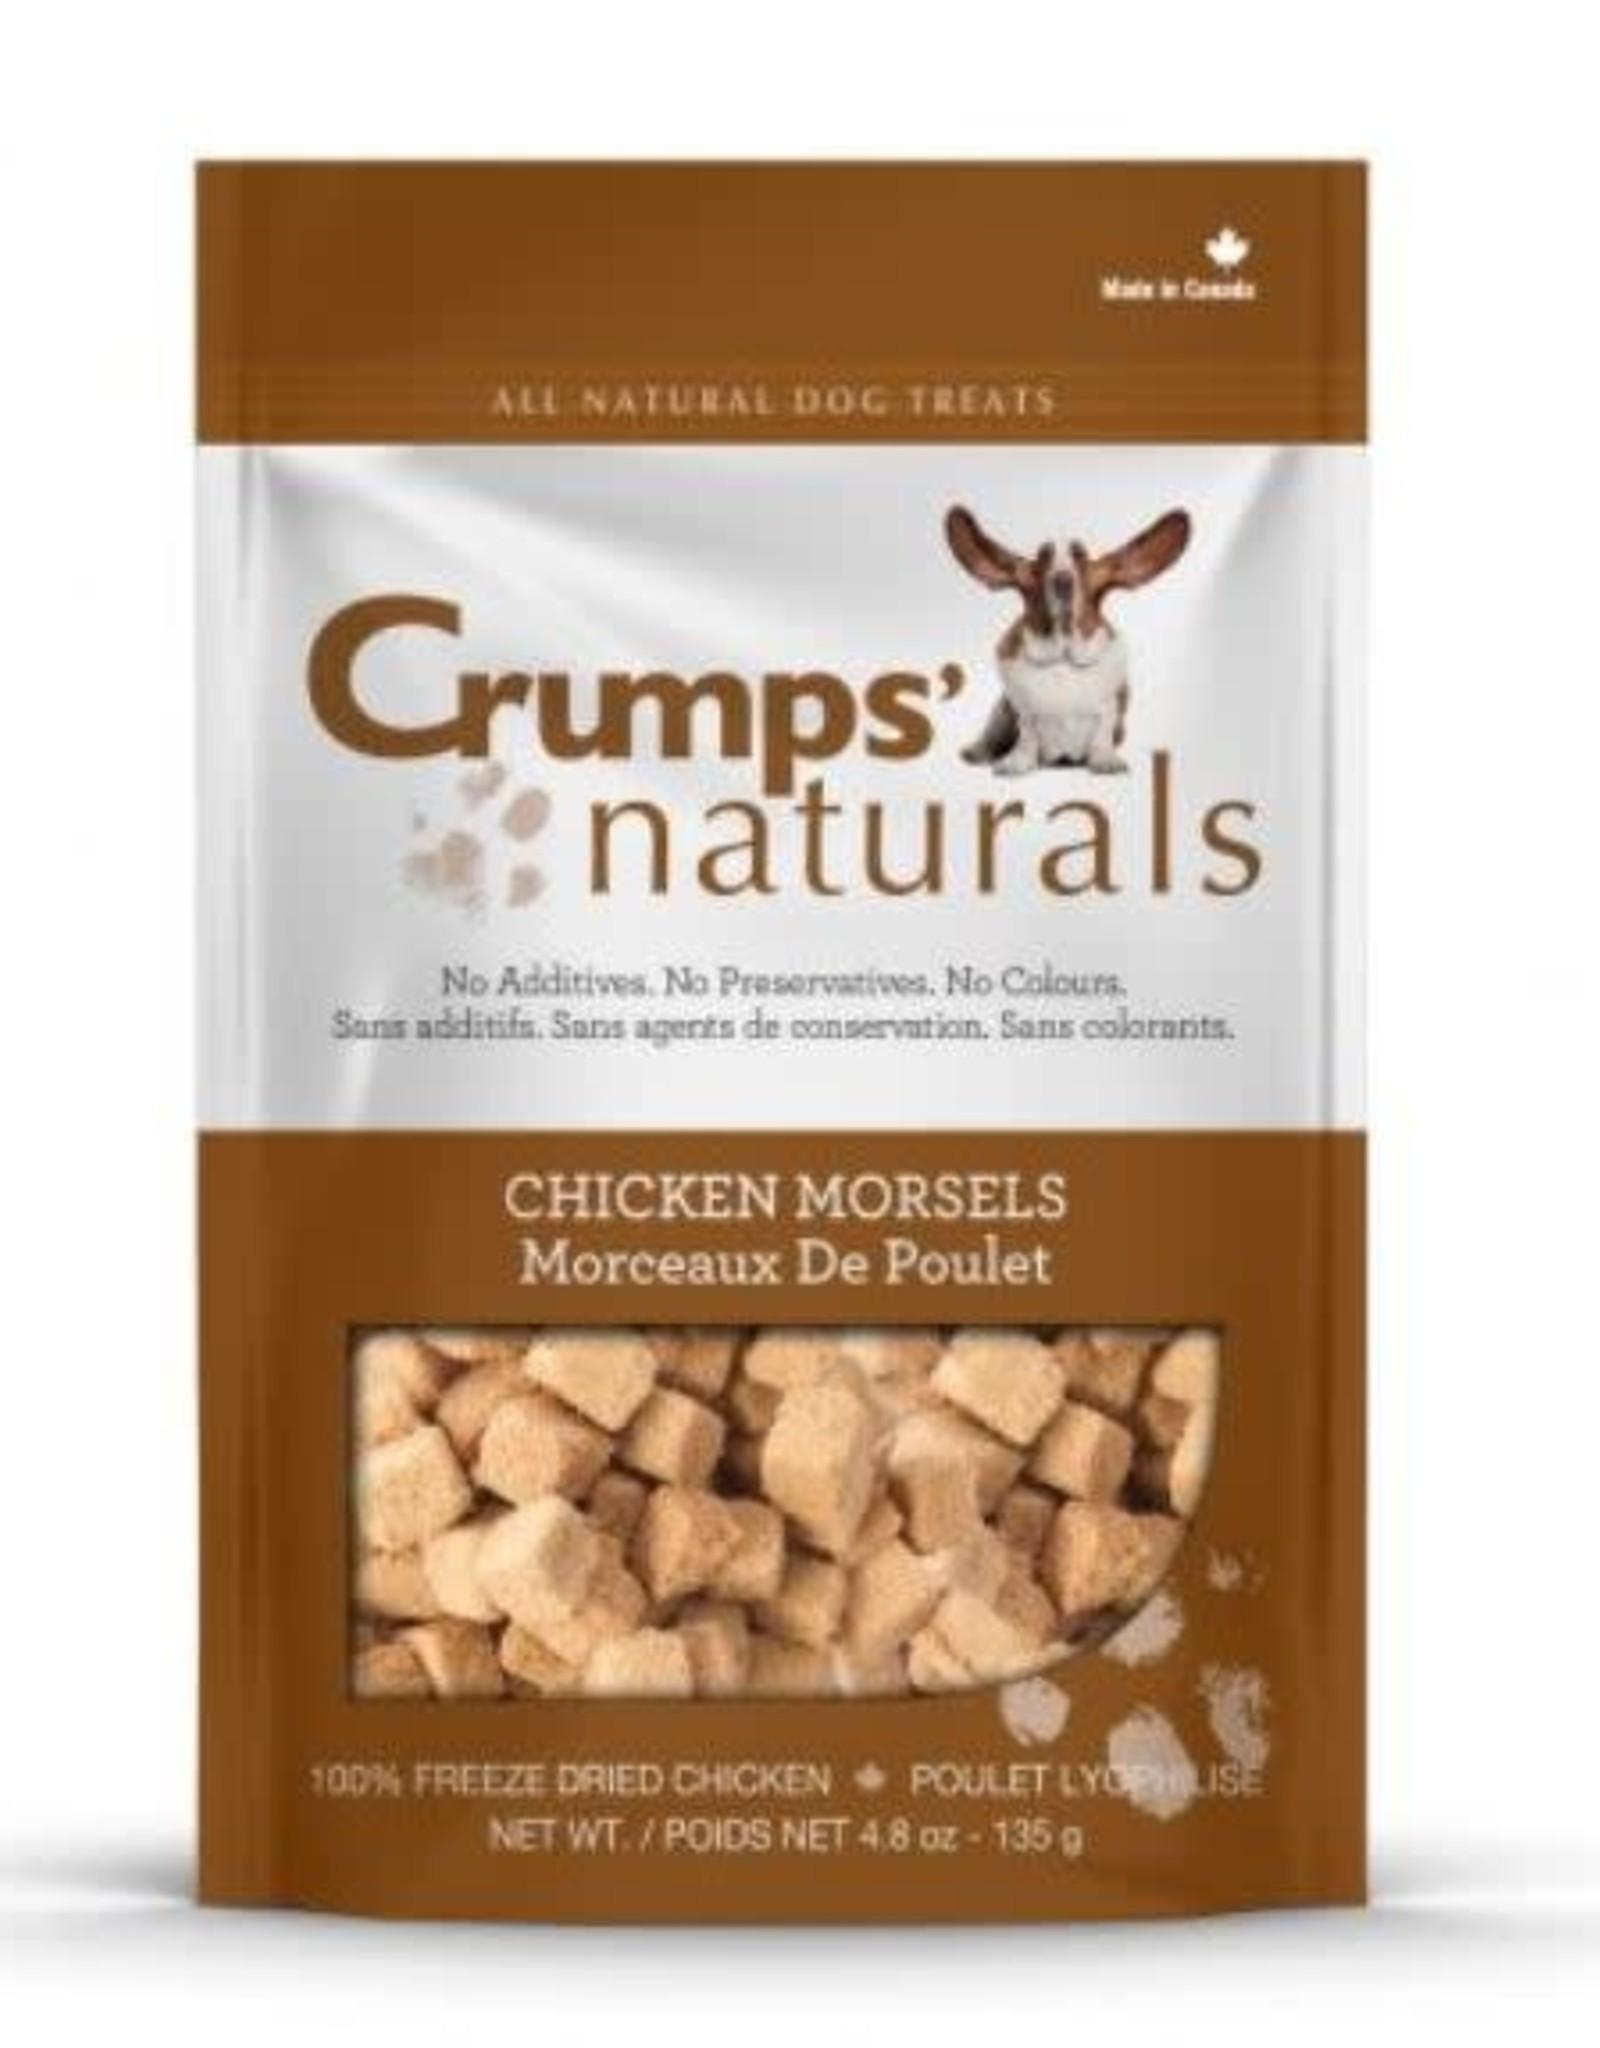 Crumps Natural Crumps Chicken Morsels  2.3oz /65g